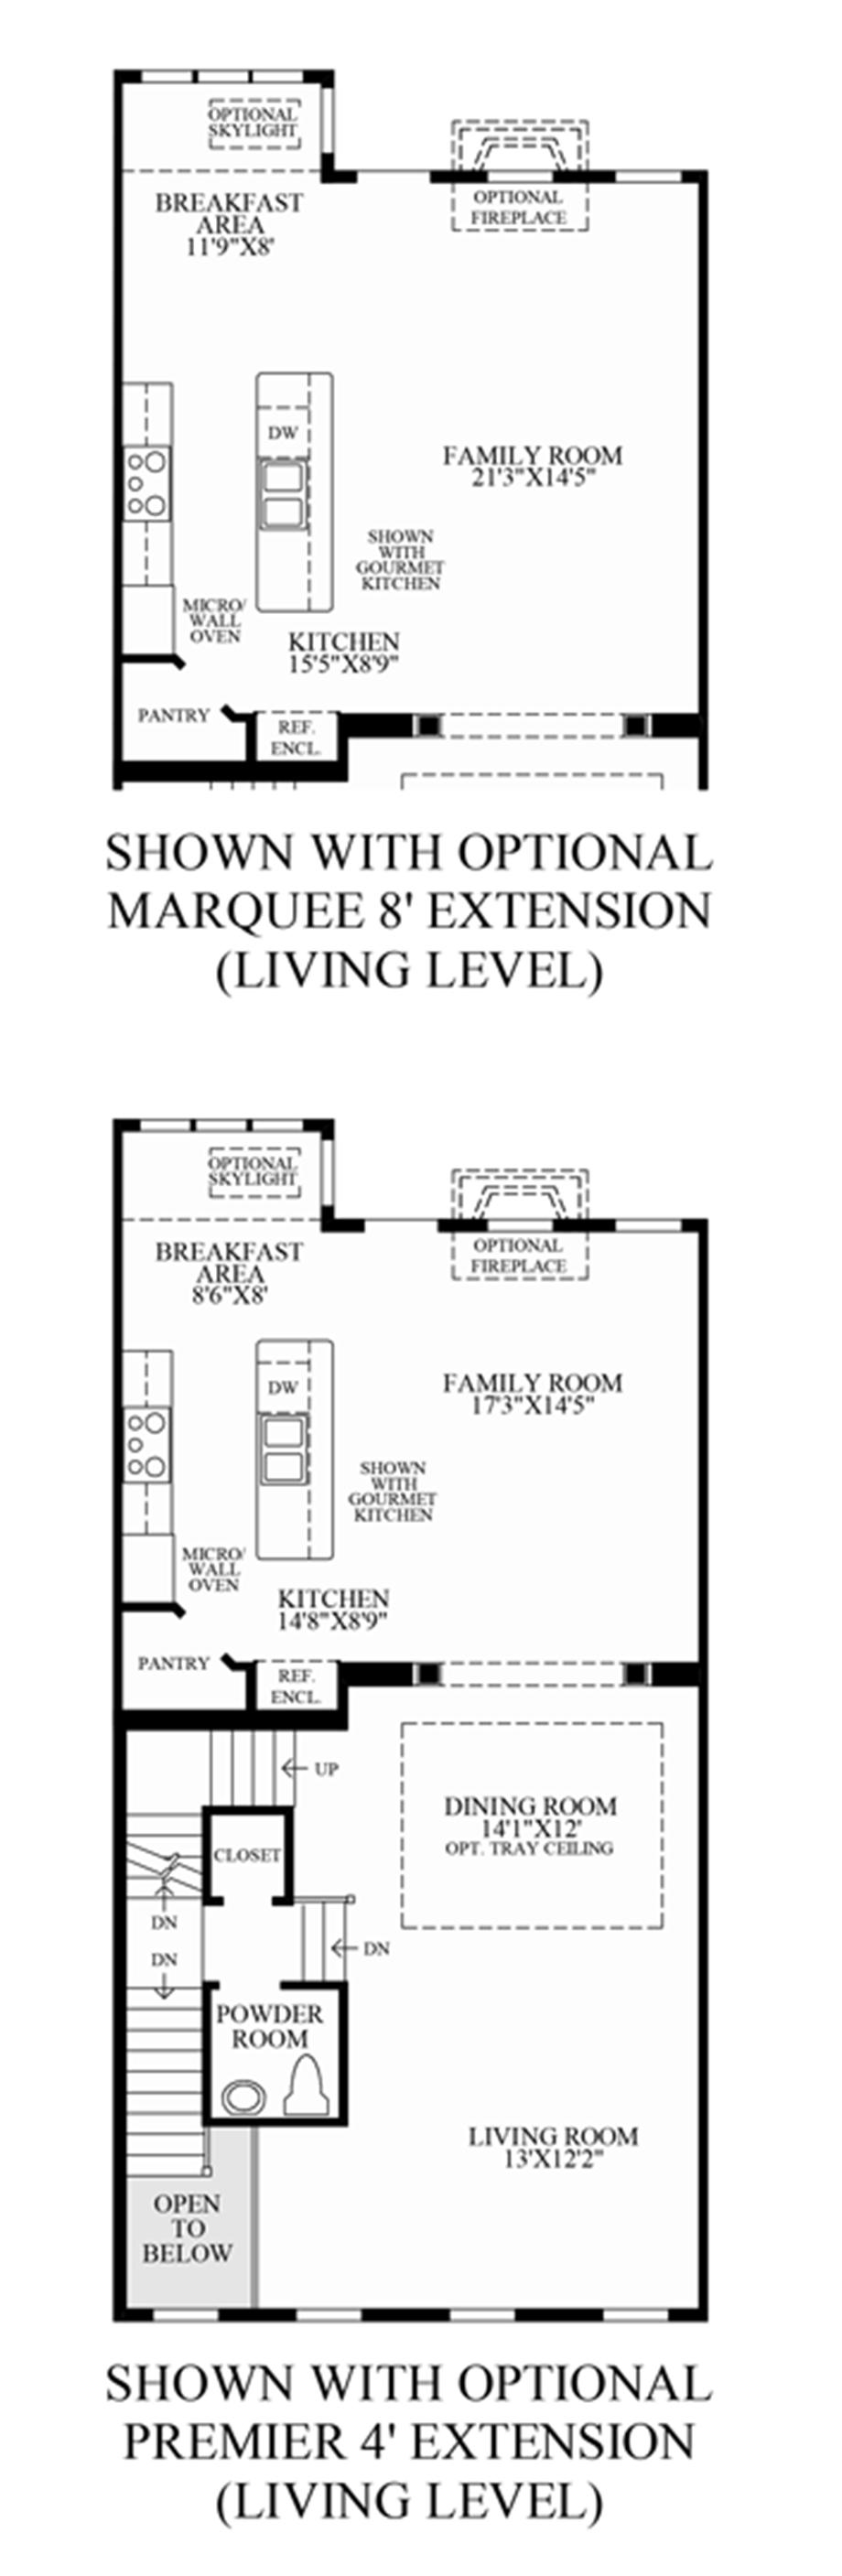 Optional Extensions Living Level Floor Plan